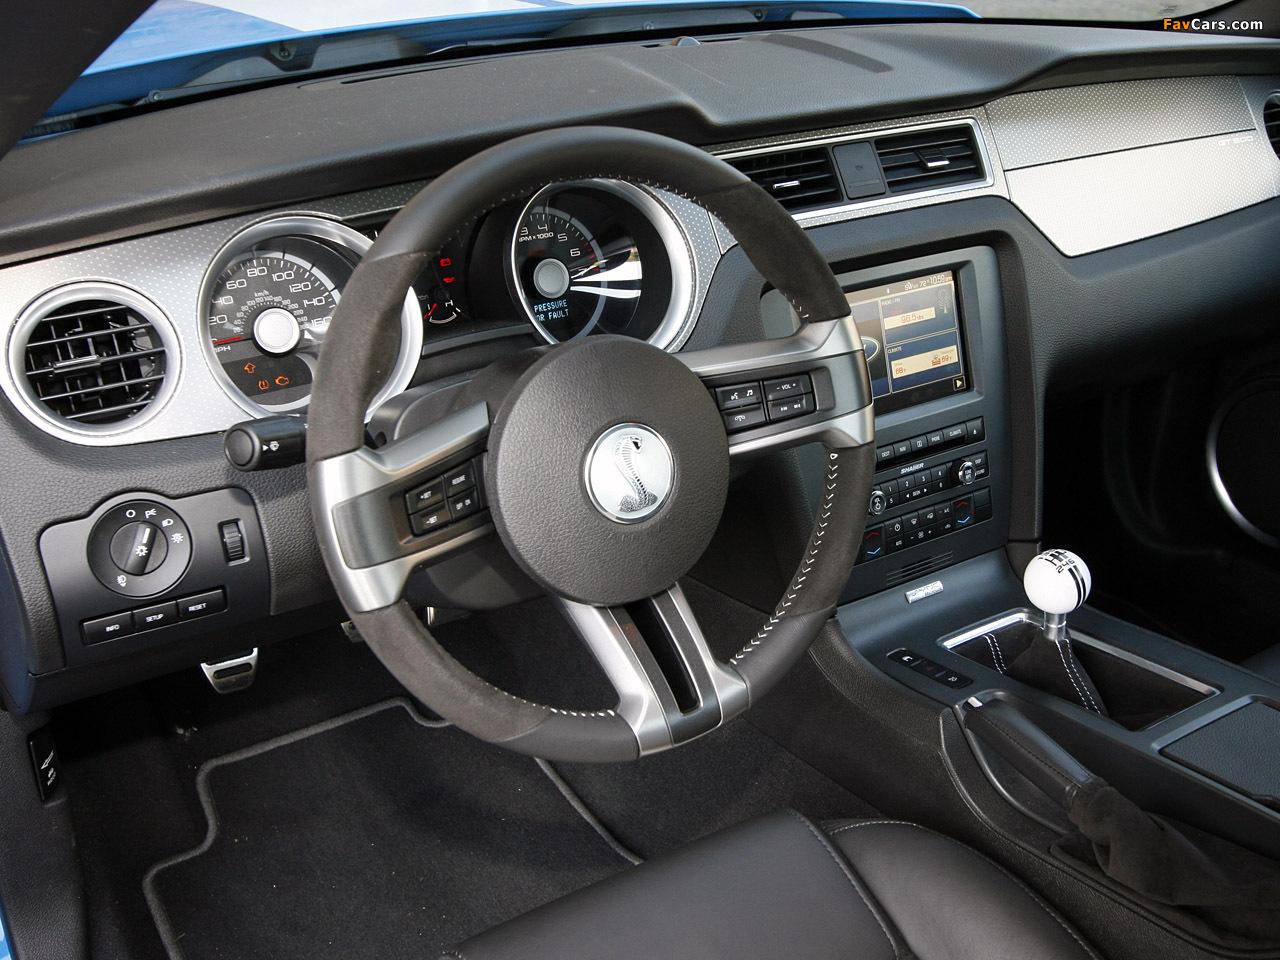 Geiger Shelby GT500 2010 photos (1280 x 960)